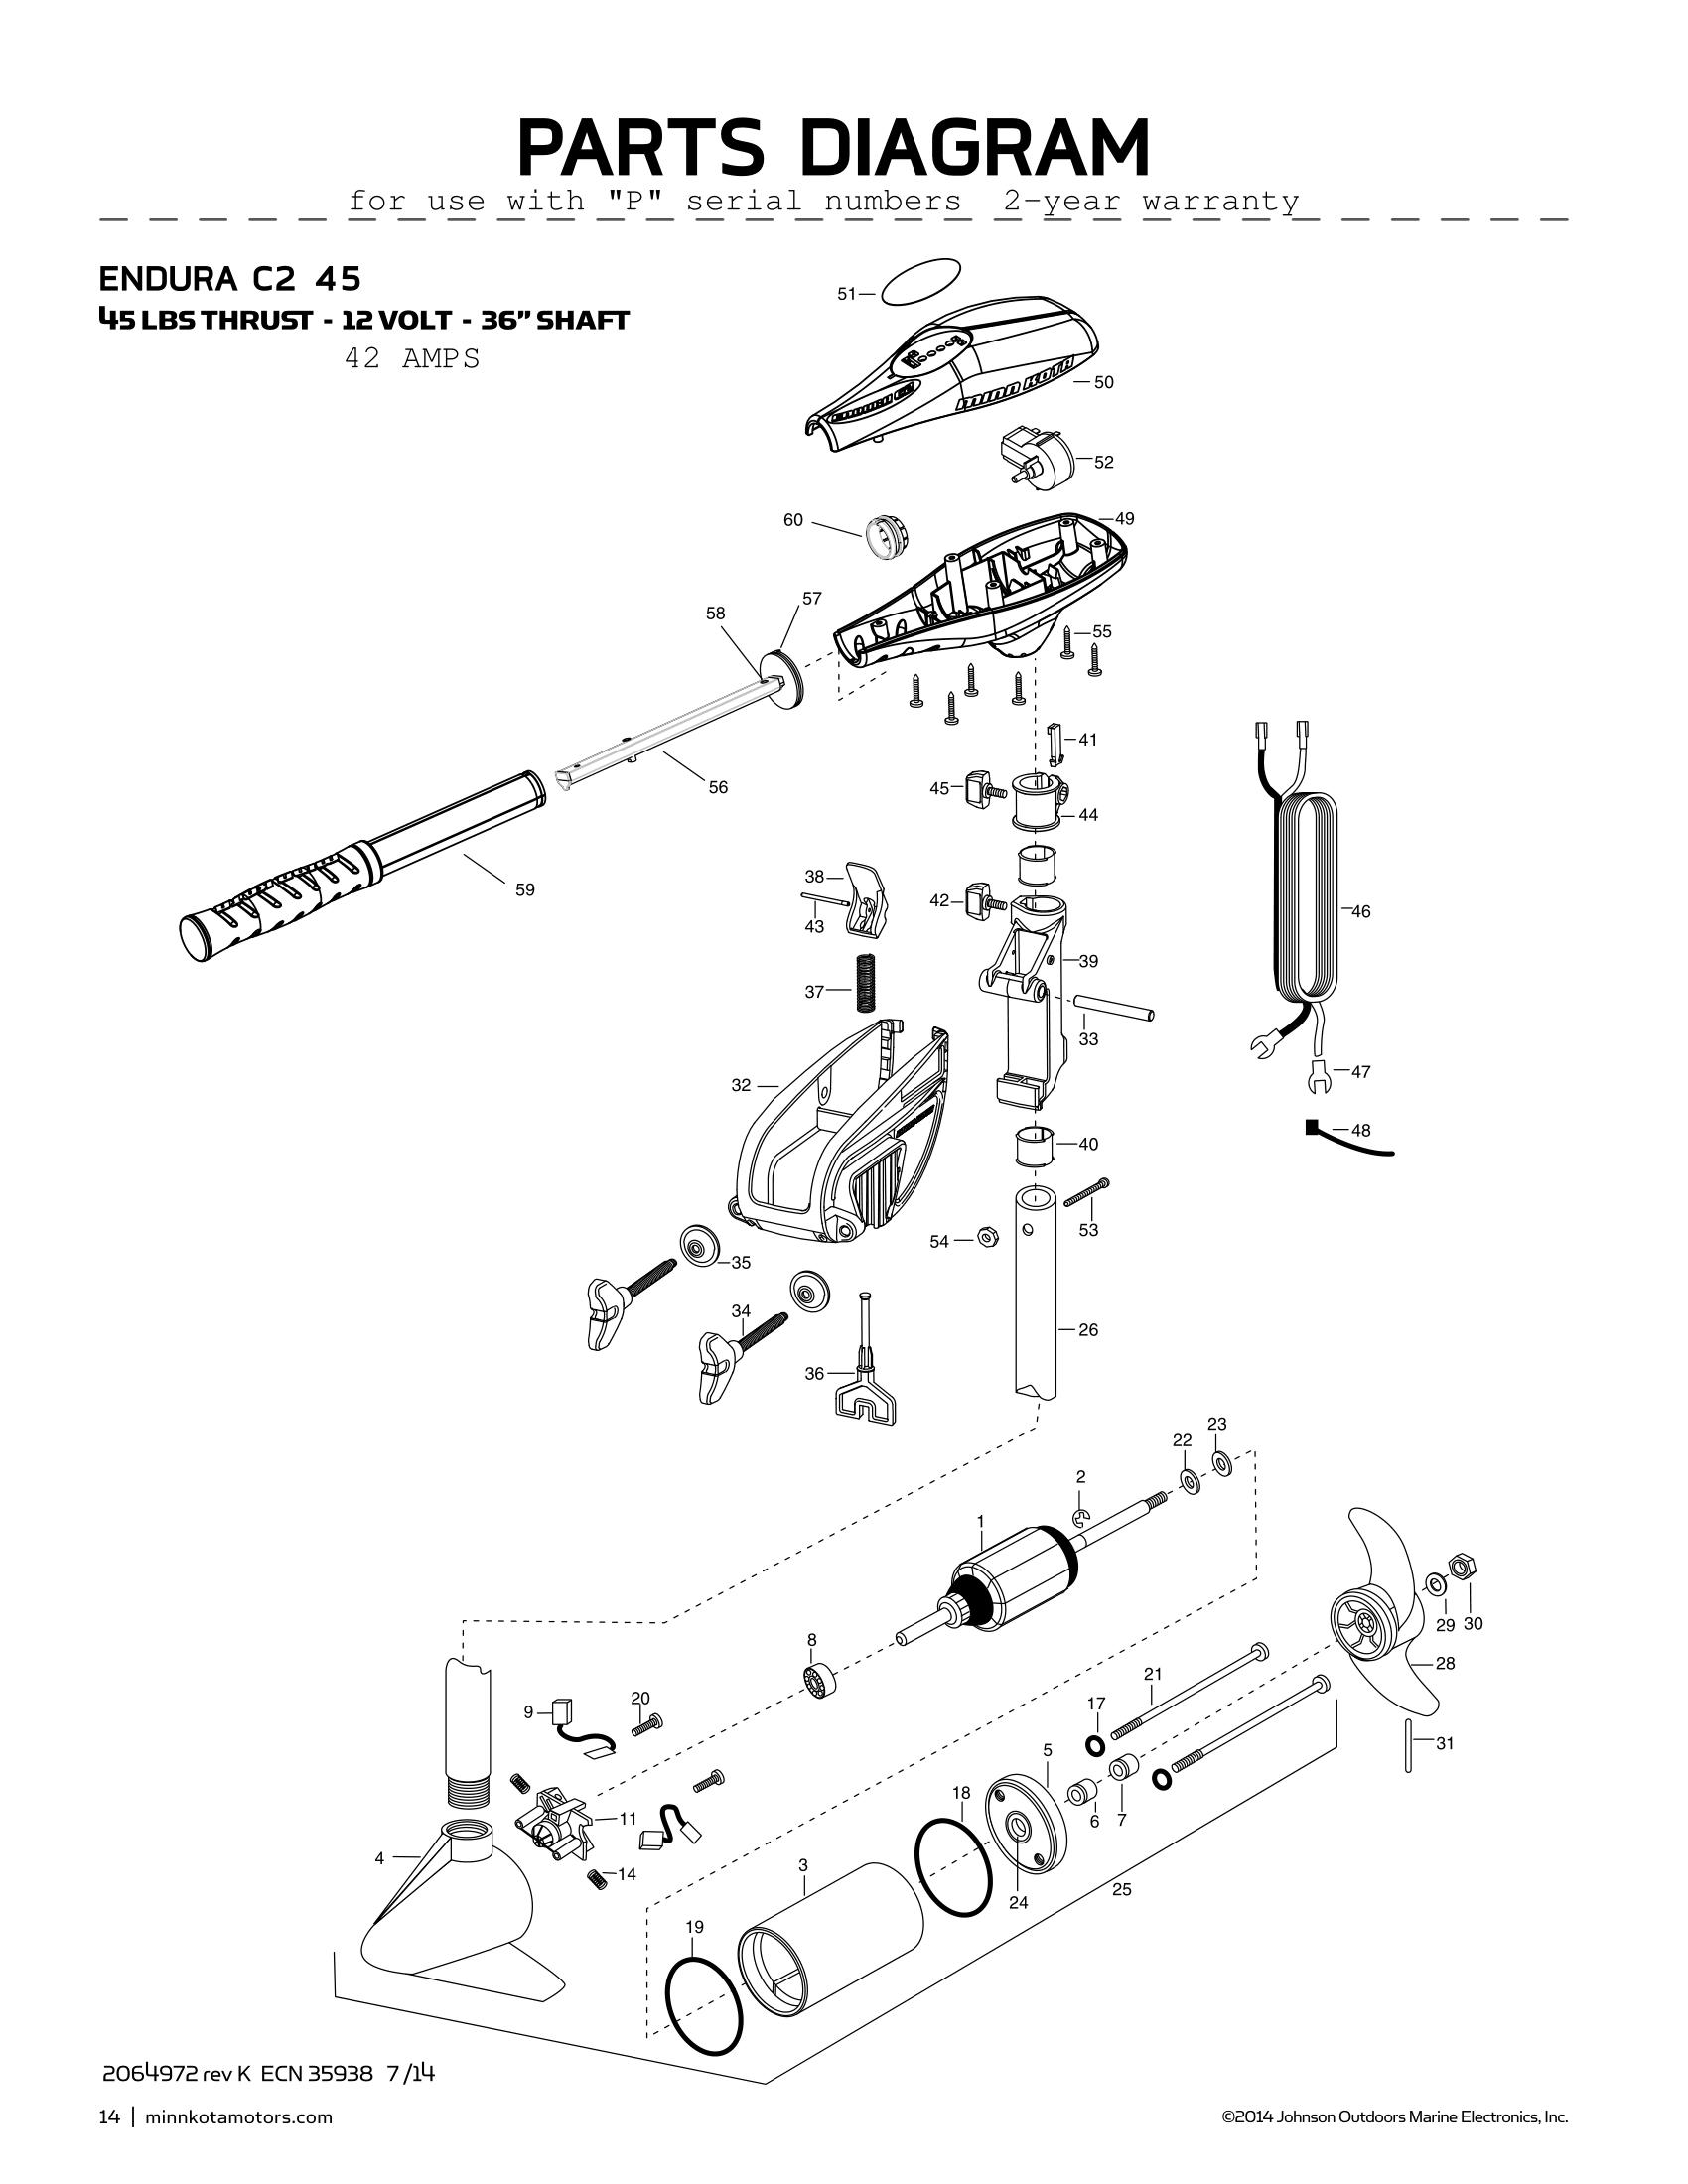 Minn Kota Edge 70 Wiring Diagram Detailed Schematics Battery Endura 40 Trolling Motor Parts Diagrams Trusted Charger